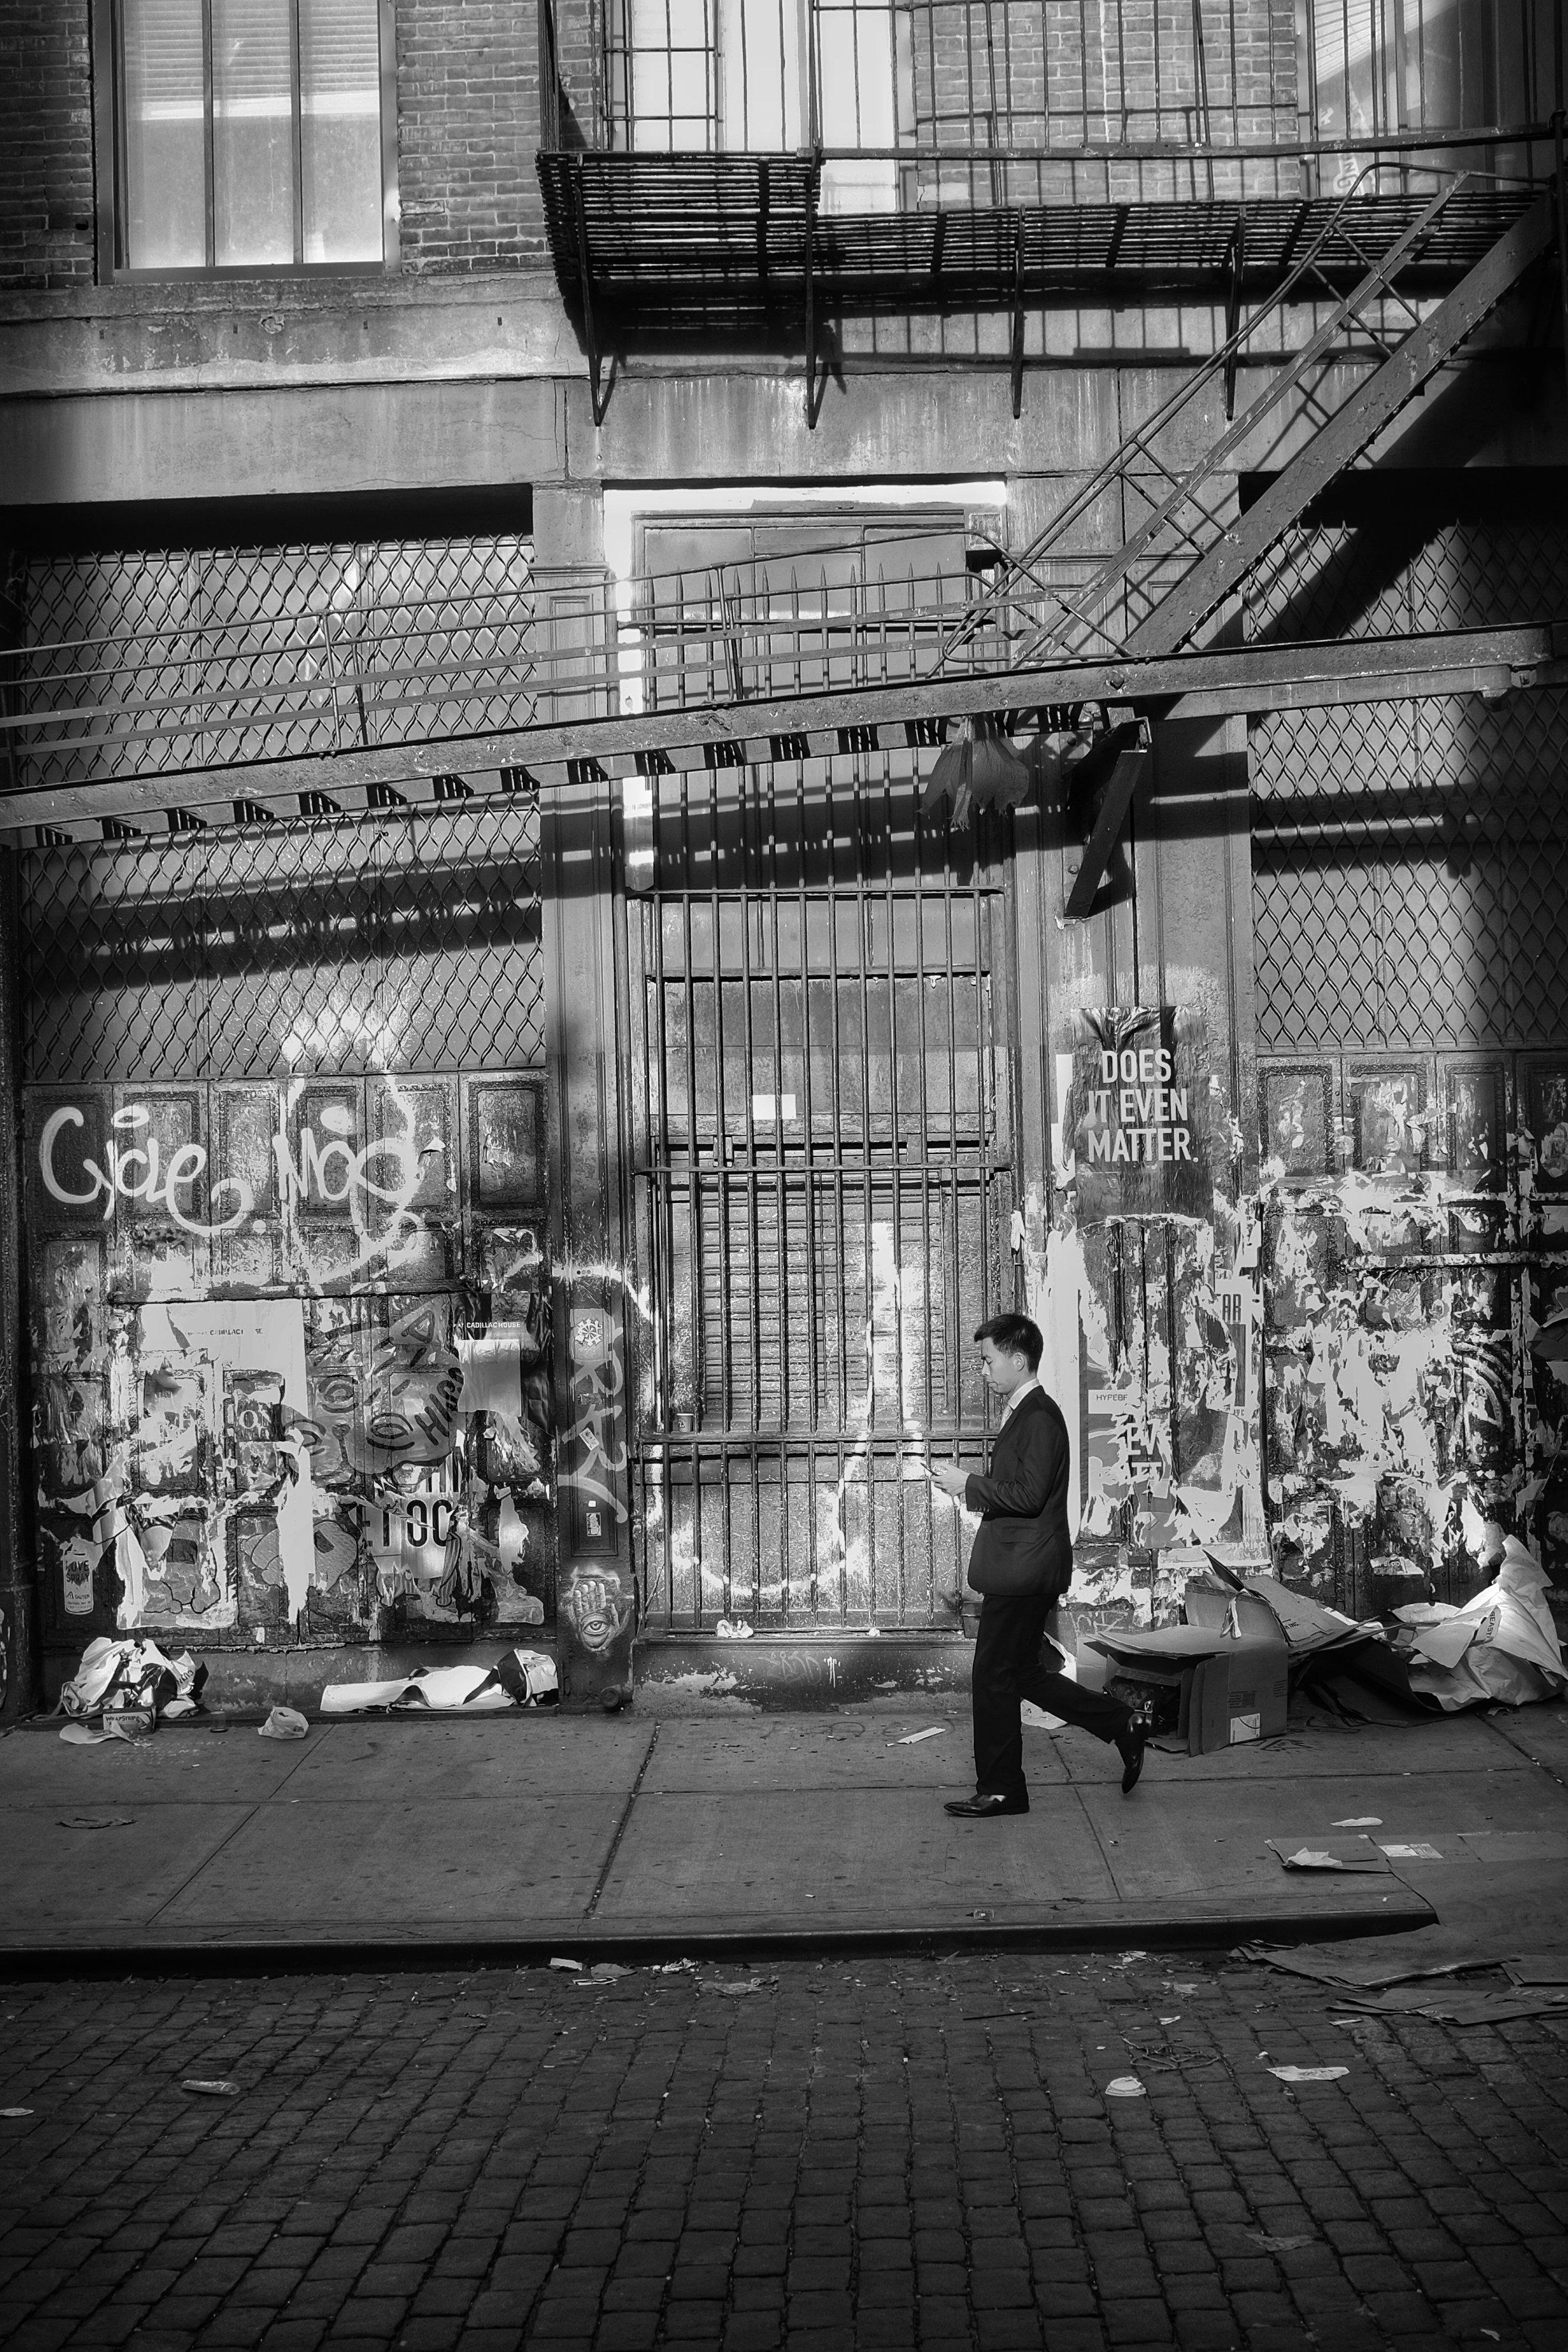 Does It Even Matter. Crosby Street. SOHO. New York City. 2016.